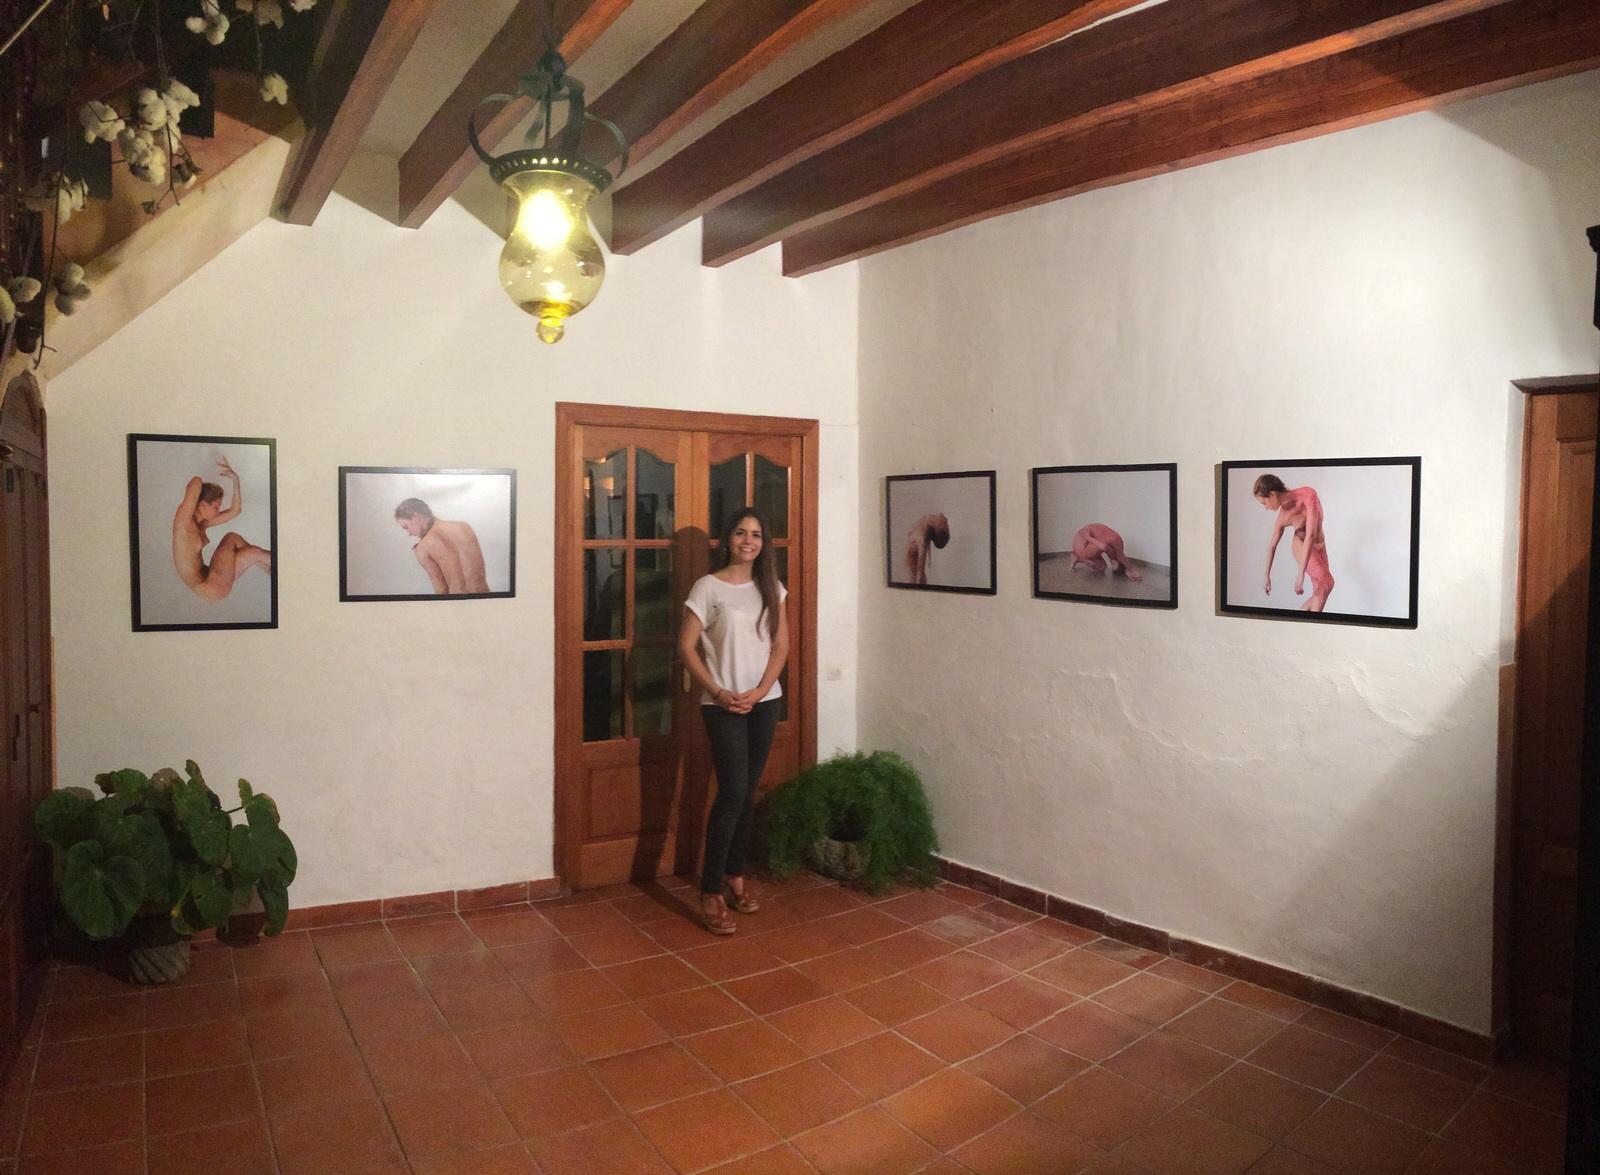 Exposició de la fotògrafa María Cano al Goletart 2015 (foto per Juan Antonio Montañez)